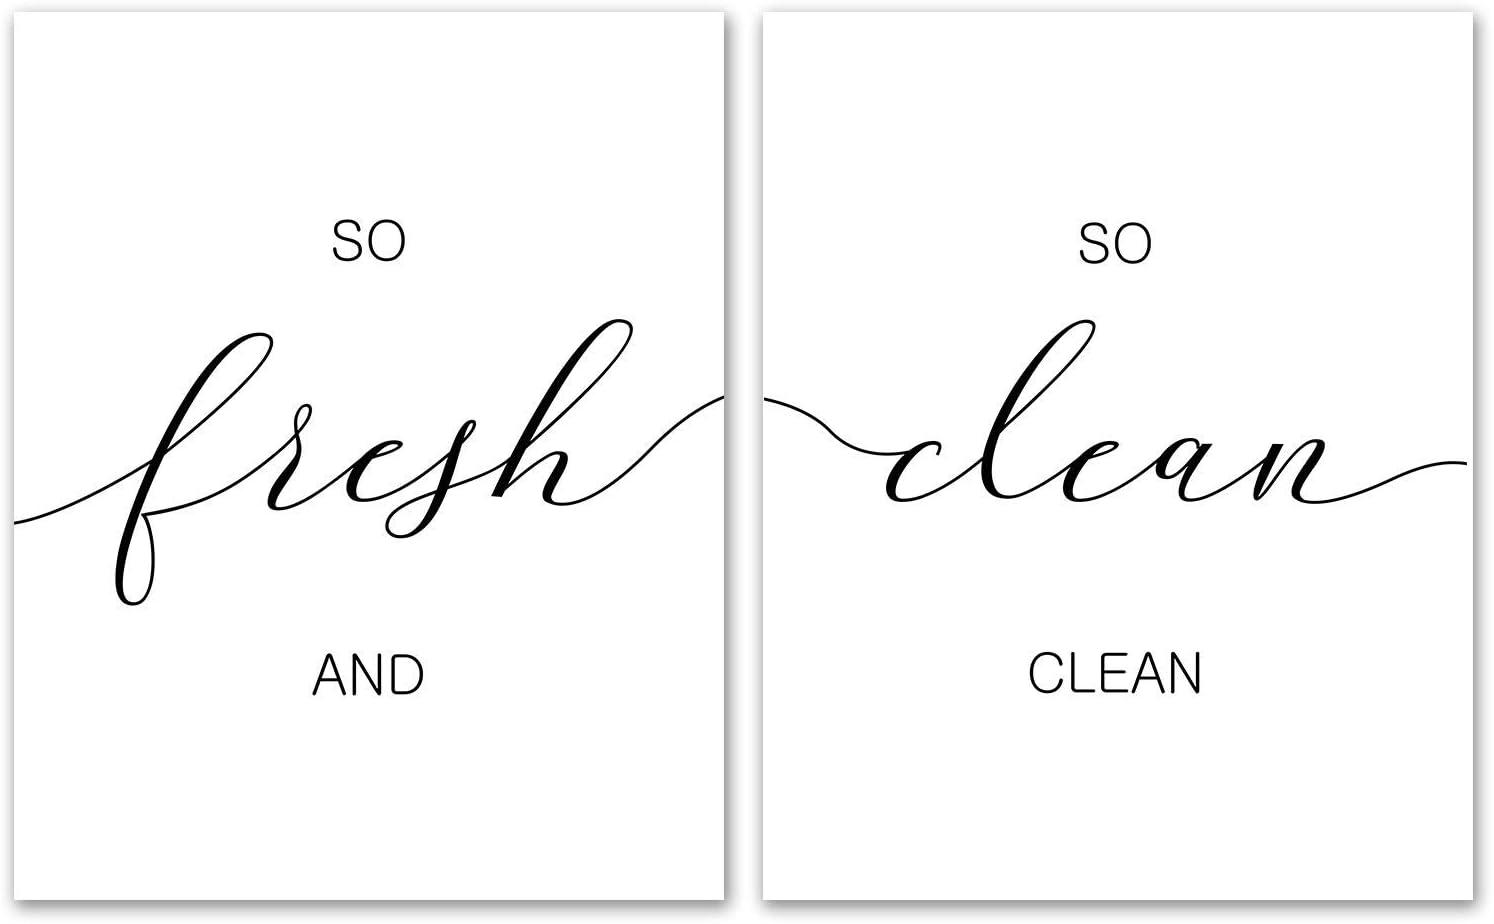 "Fresh and So Clean Clean Set of 2 Prints - Unframed, Bathroom Decor, Laundry Room Sign, Modern Farmhouse Sign, Shower Decor, Funny Saying, Bathroom Wall Art (So Fresh and So Clean Clean, 8"" x 10"")"